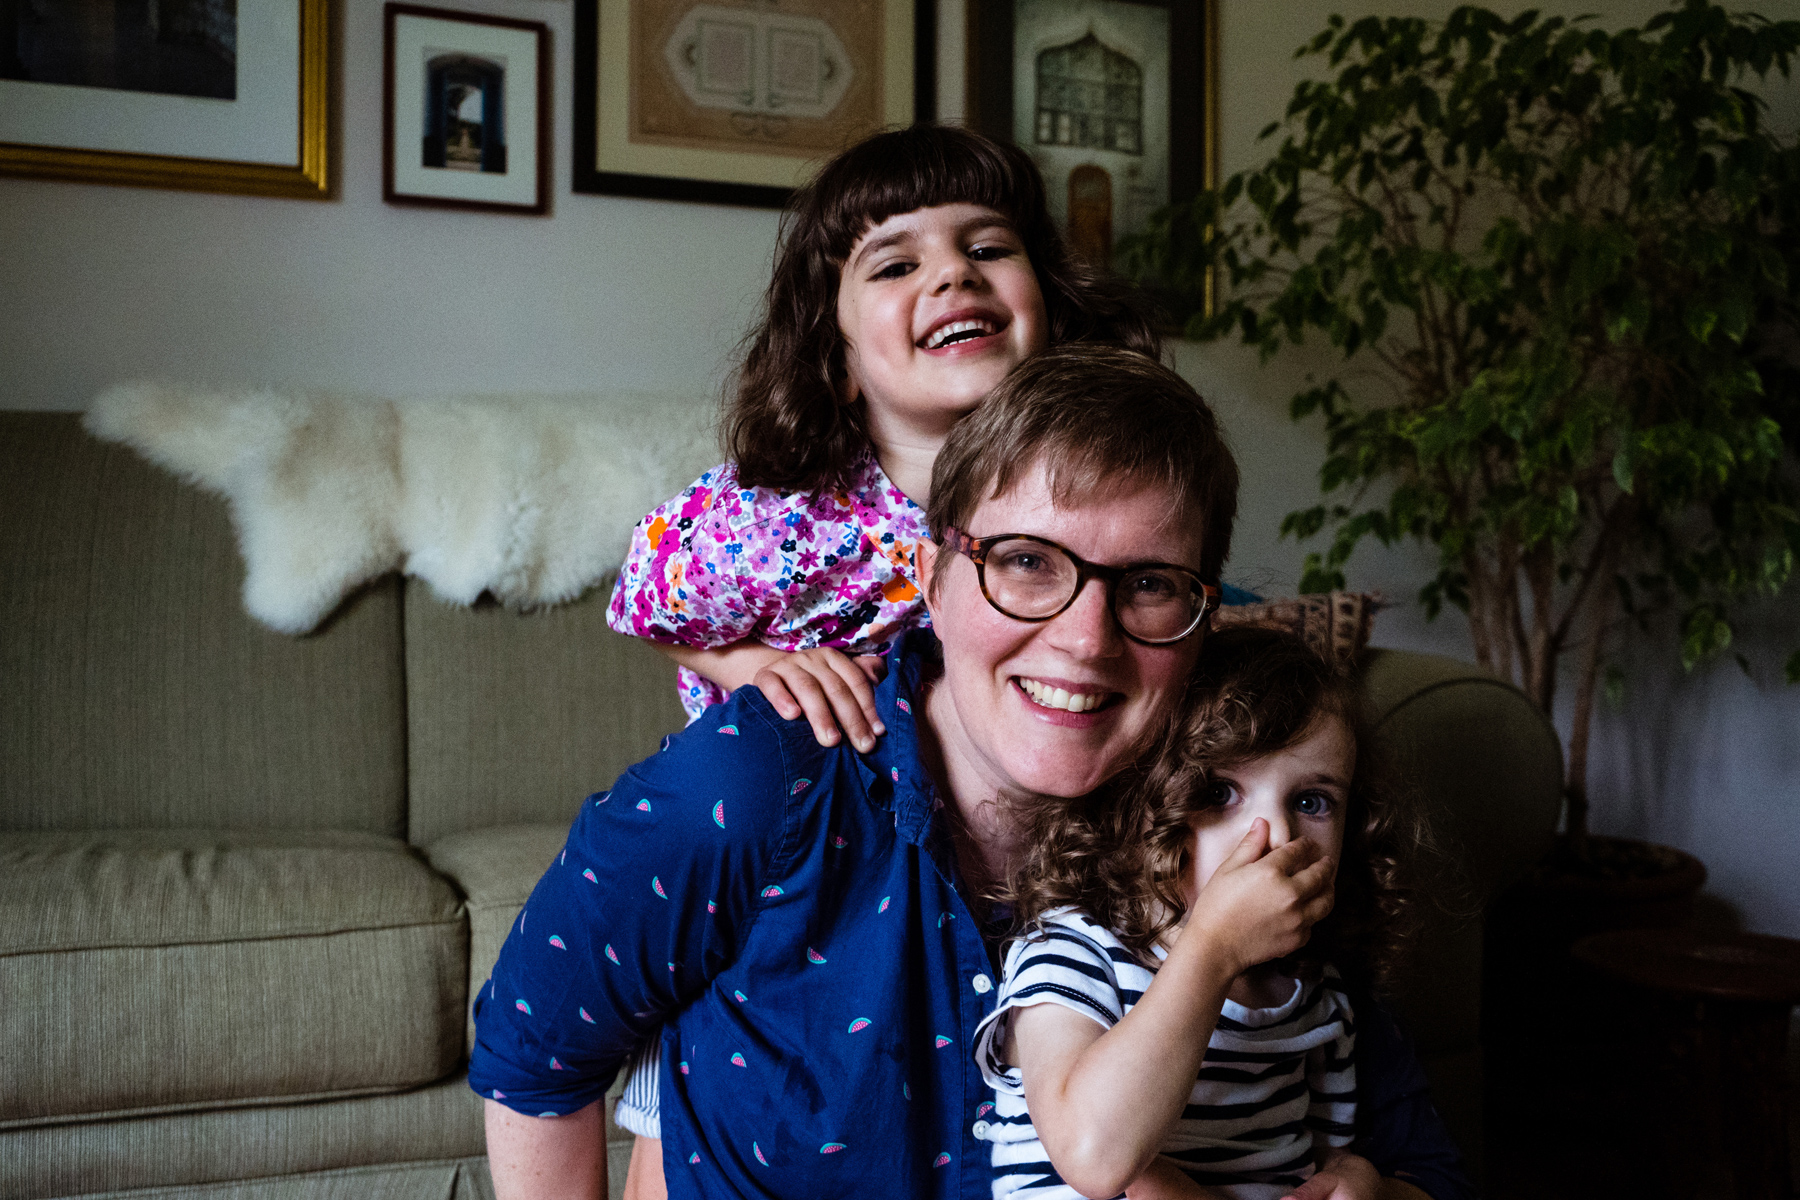 009-charlottetown-family-portraits-kandisebrown-vzg2018